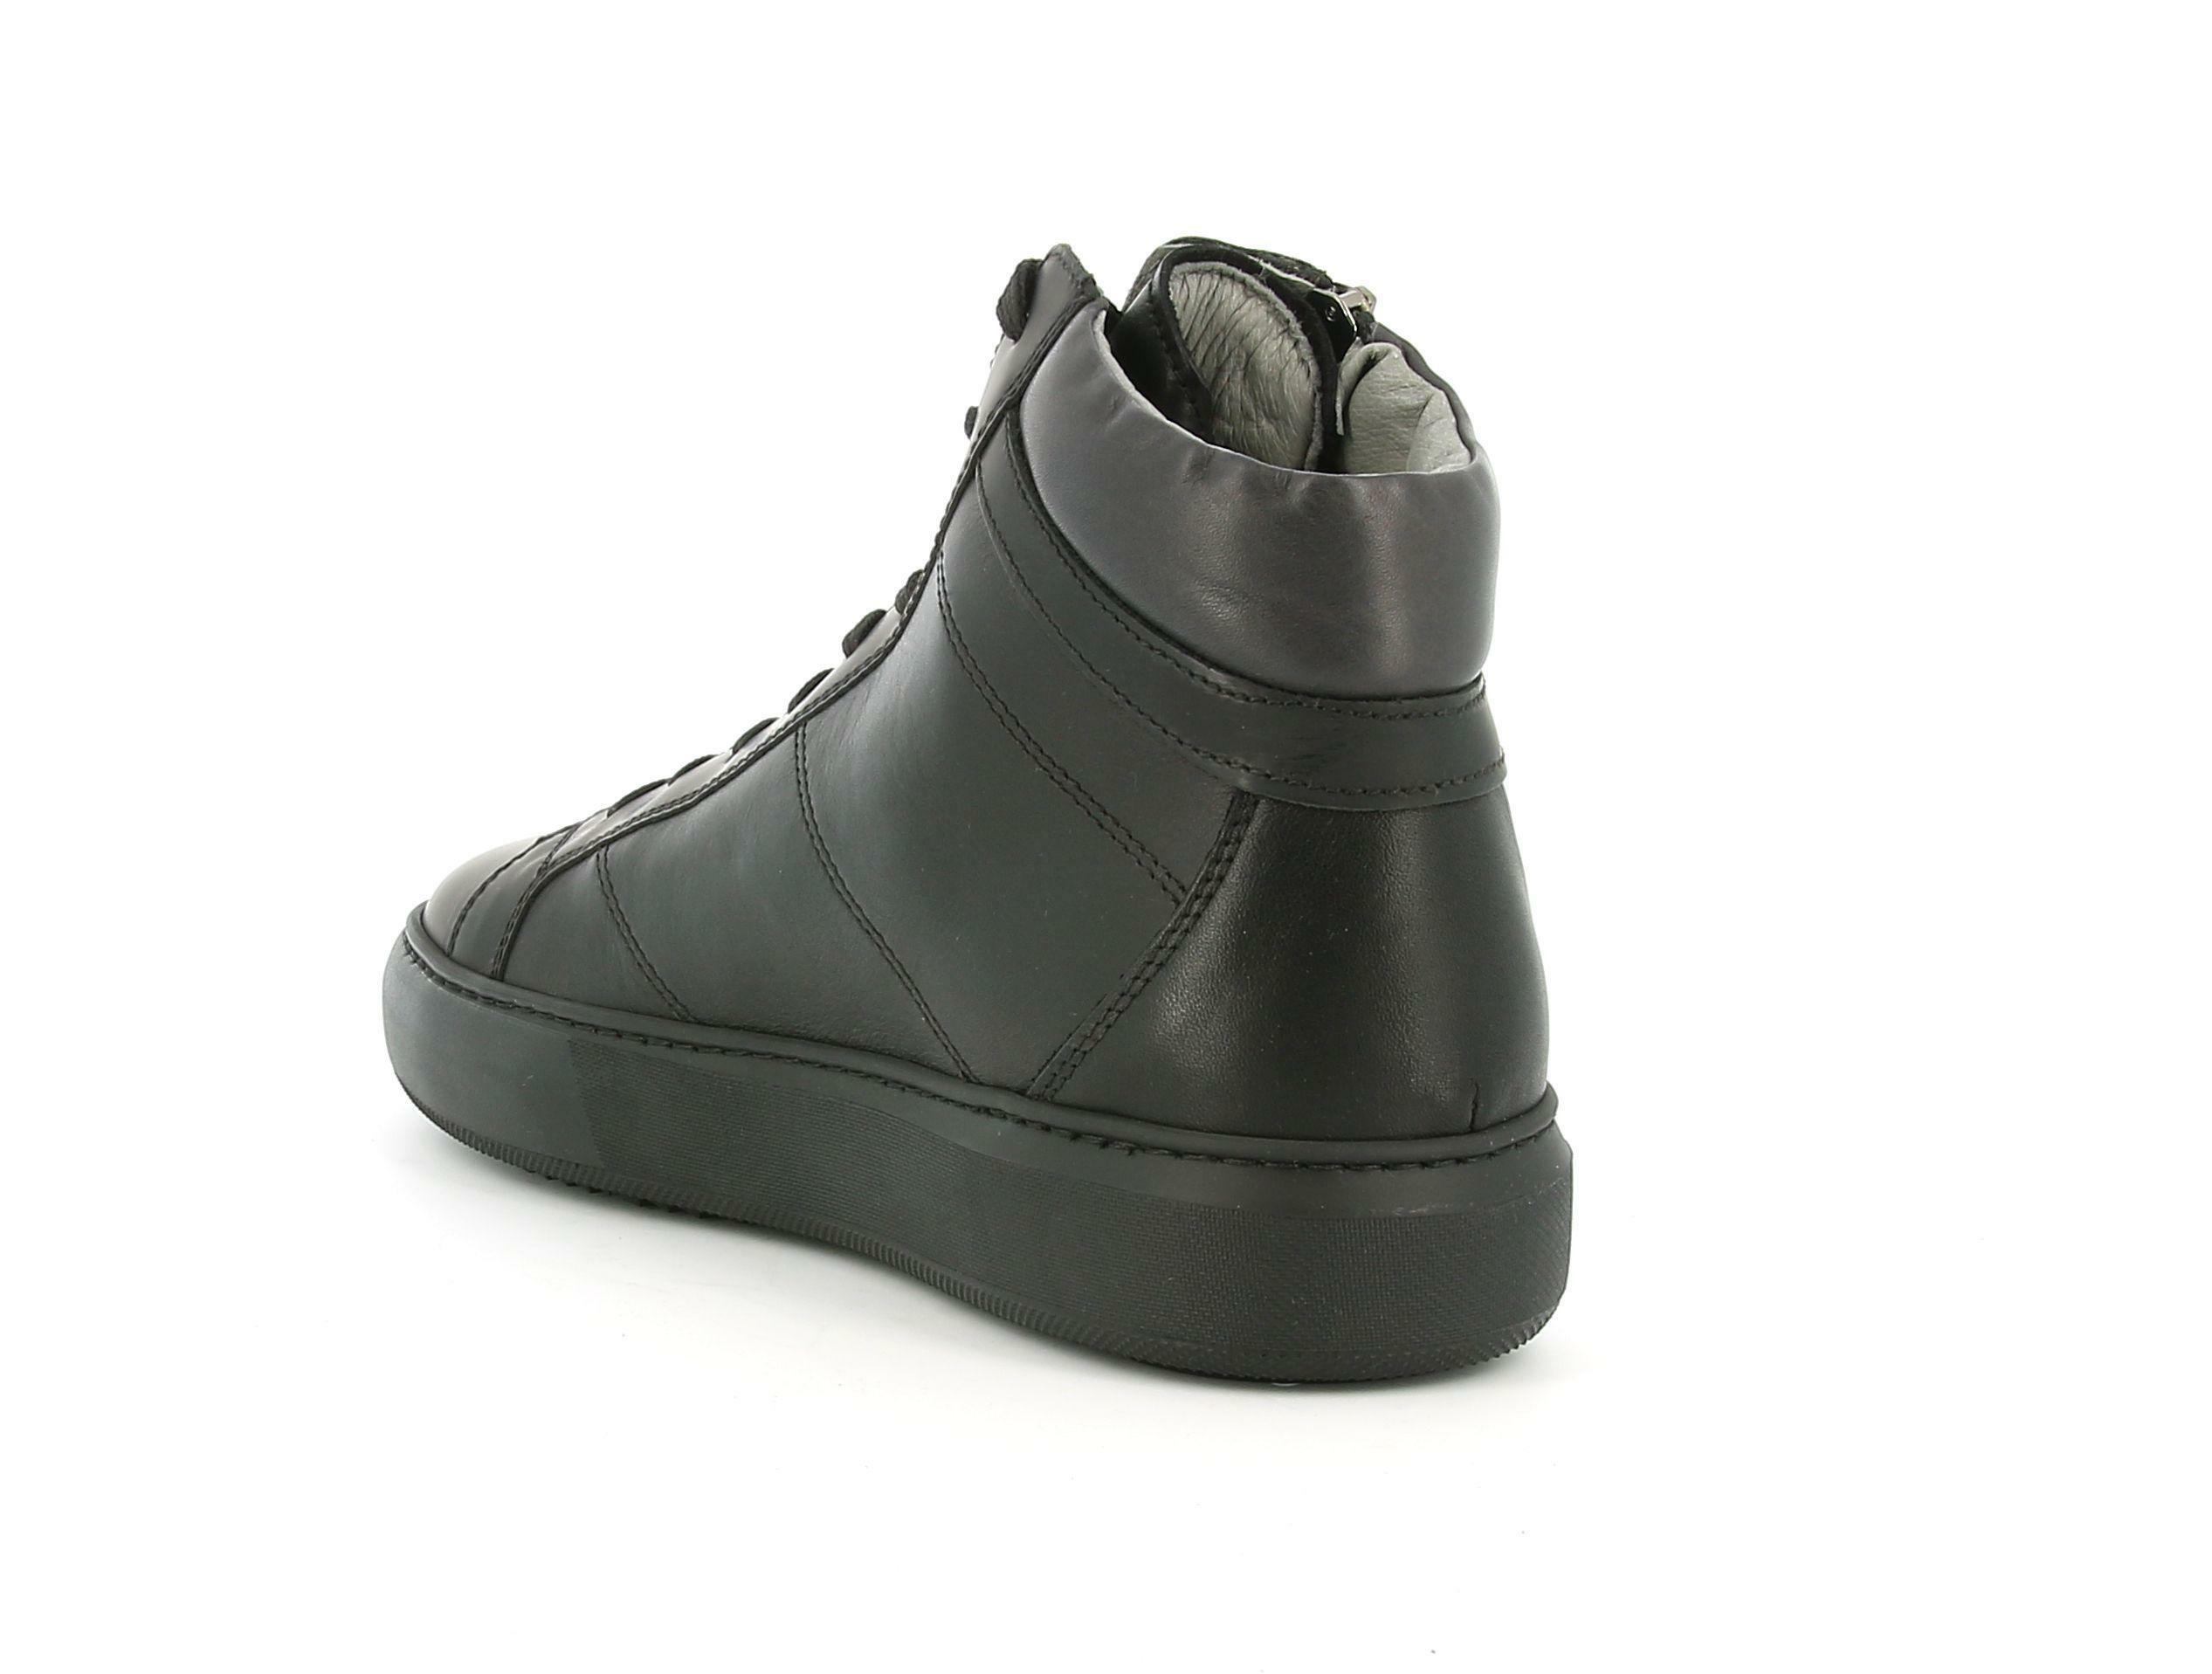 nero giardini nero giardini nero giadrini i001803u 100 nero sneakers alta uomo